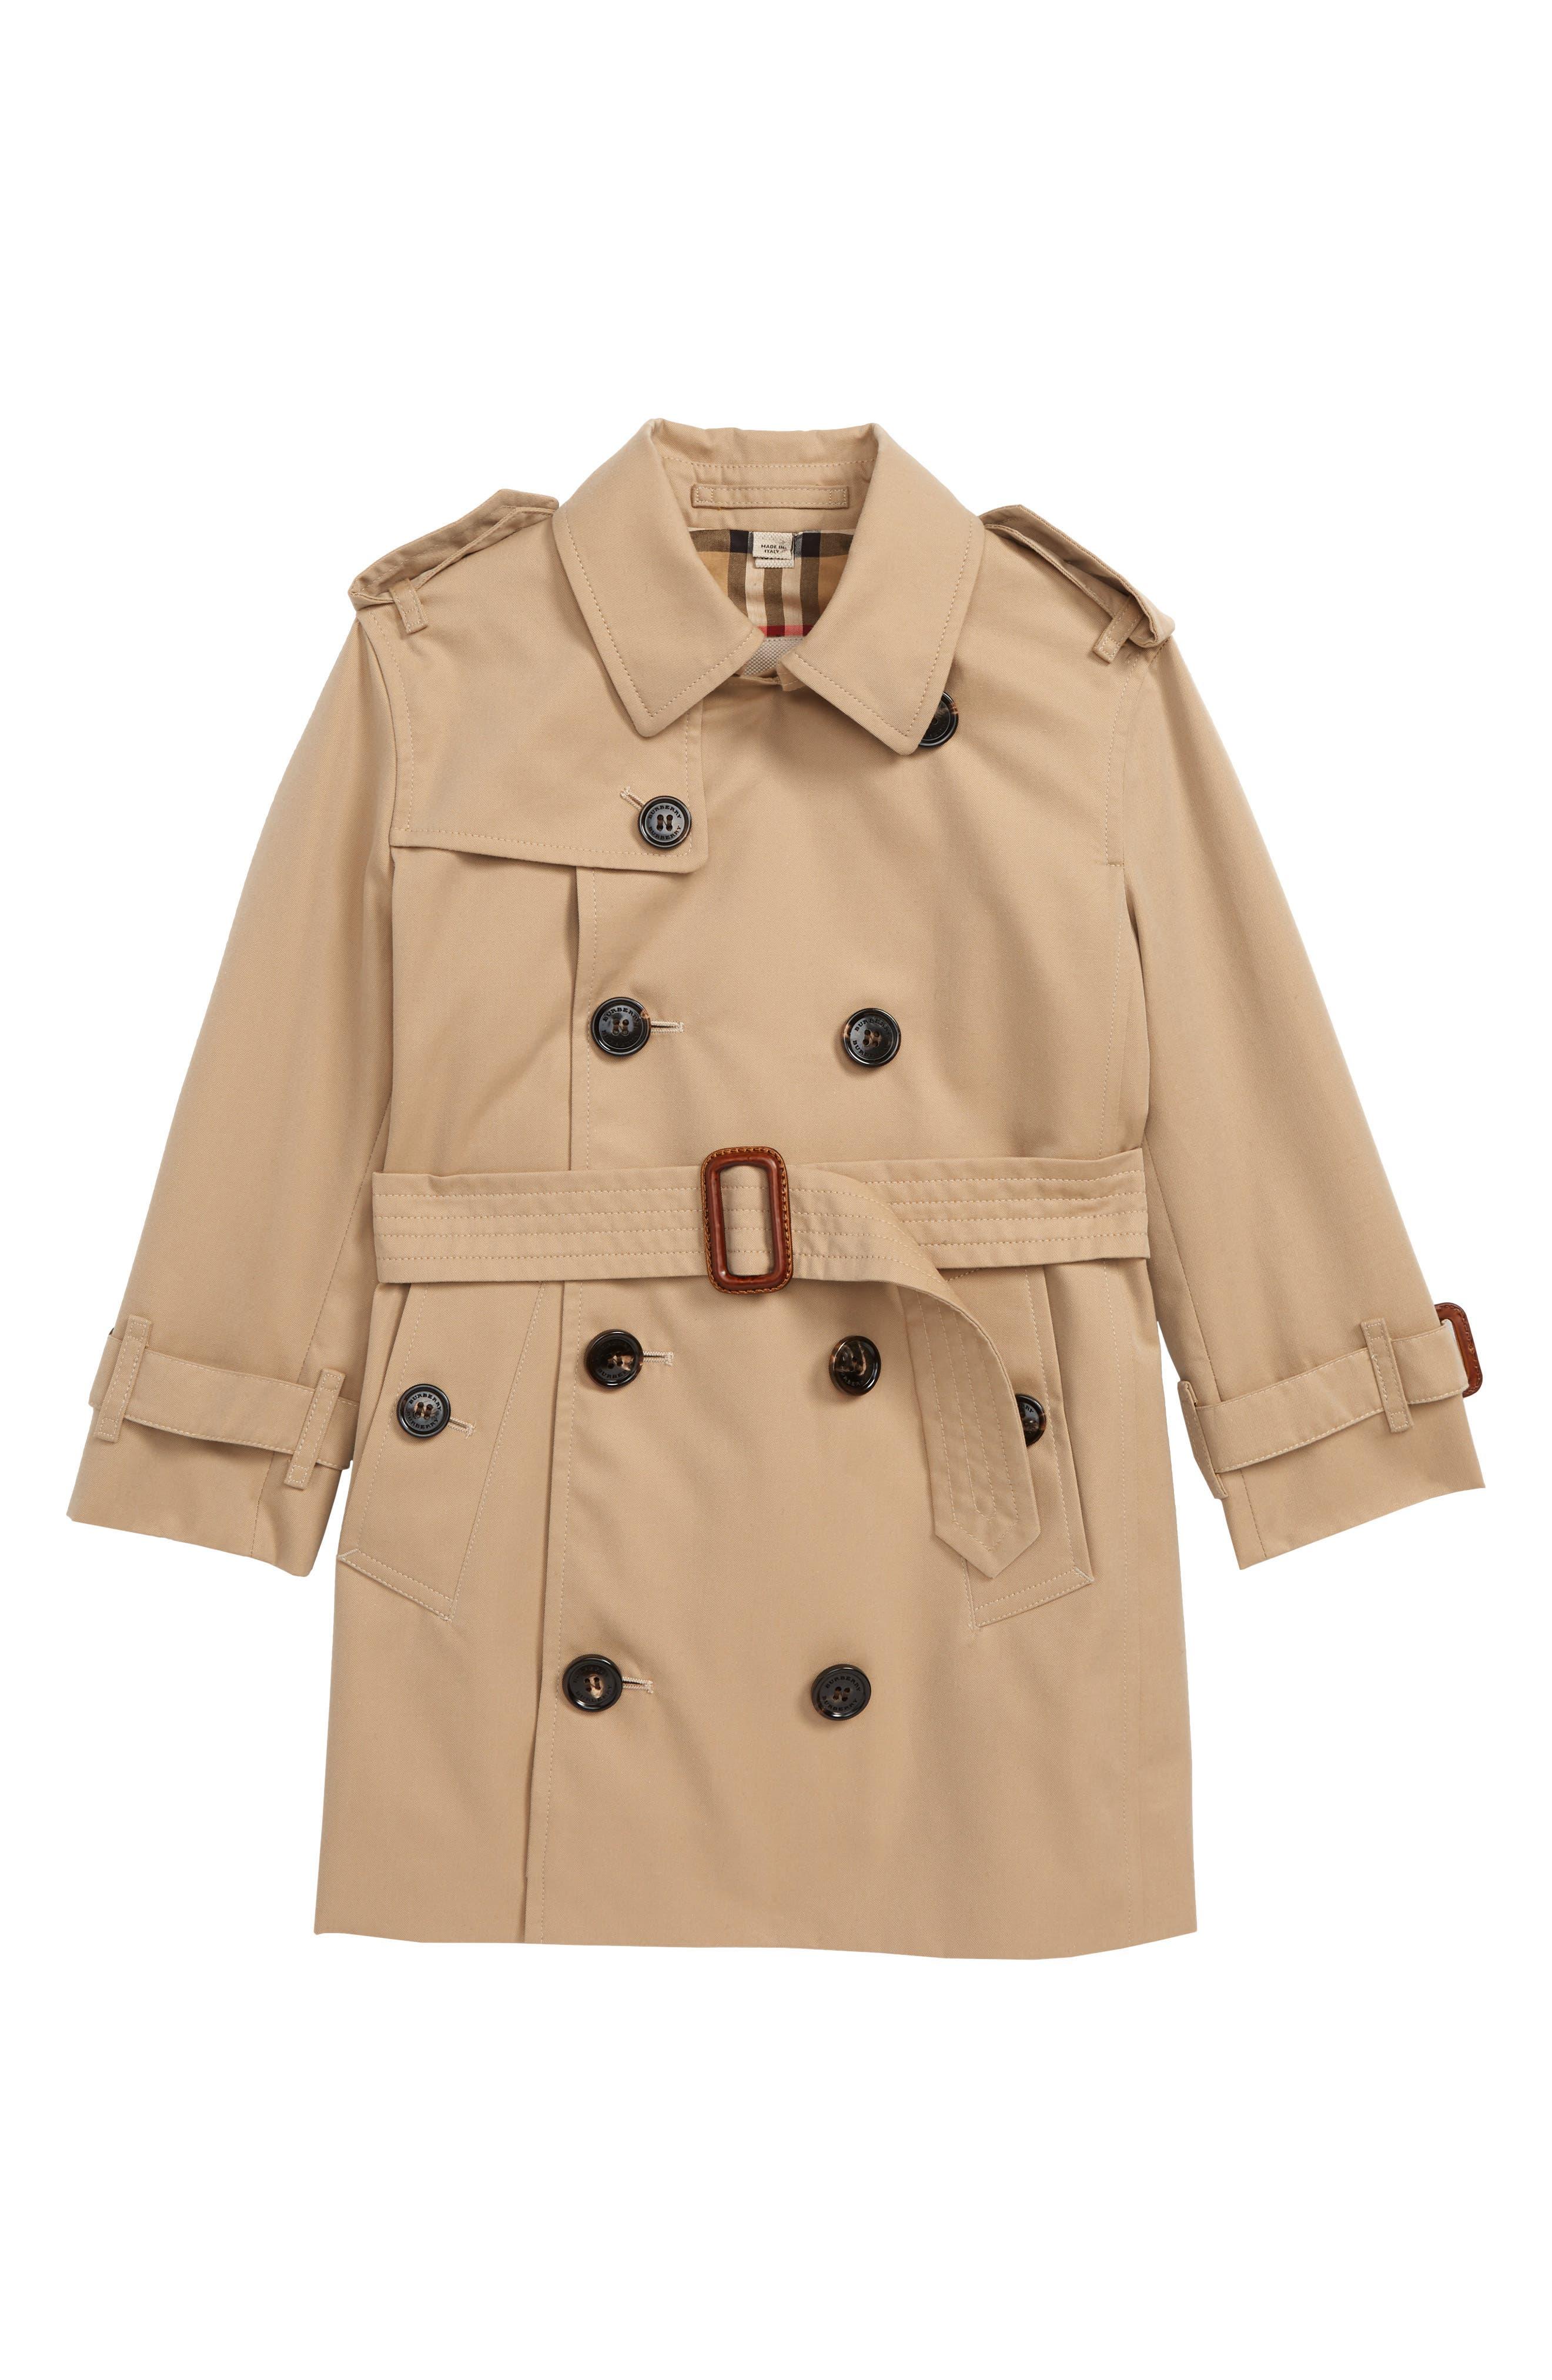 Mayfair Trench Coat,                             Main thumbnail 1, color,                             HONEY